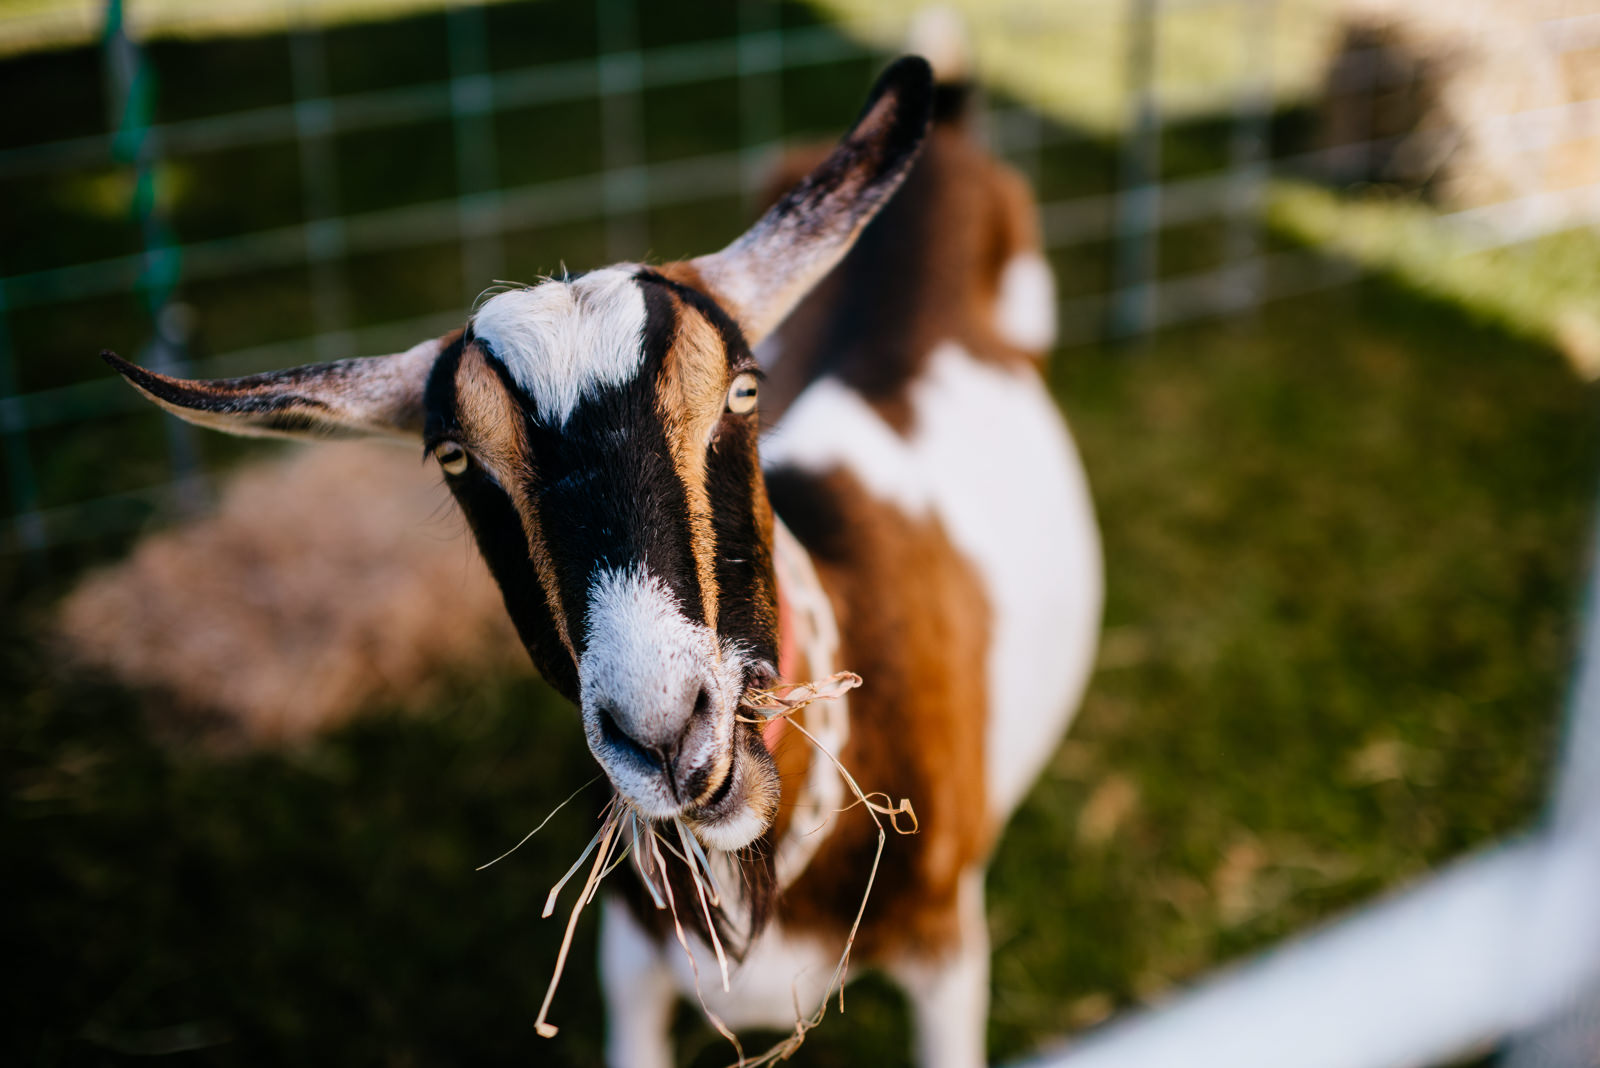 hungry goat eats straw wv farm wedding